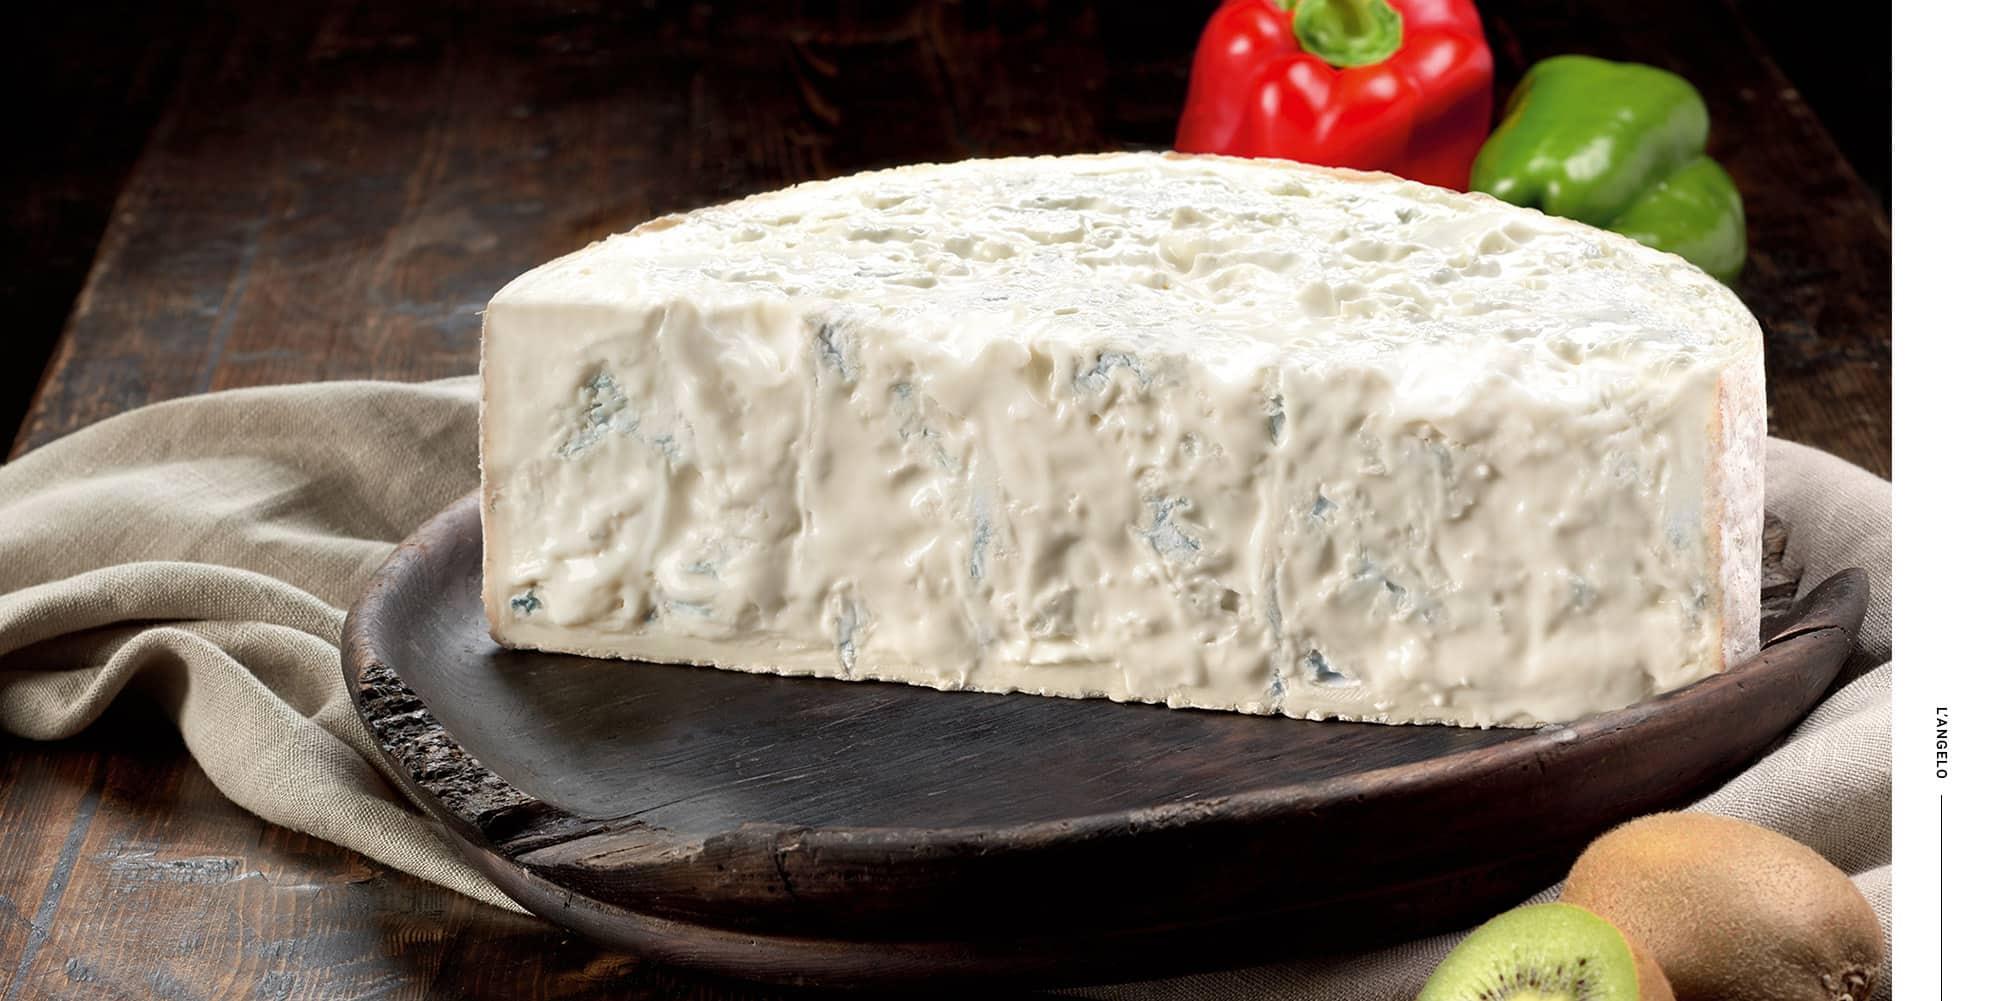 Gorgonzola dolce DOP Baruffaldi